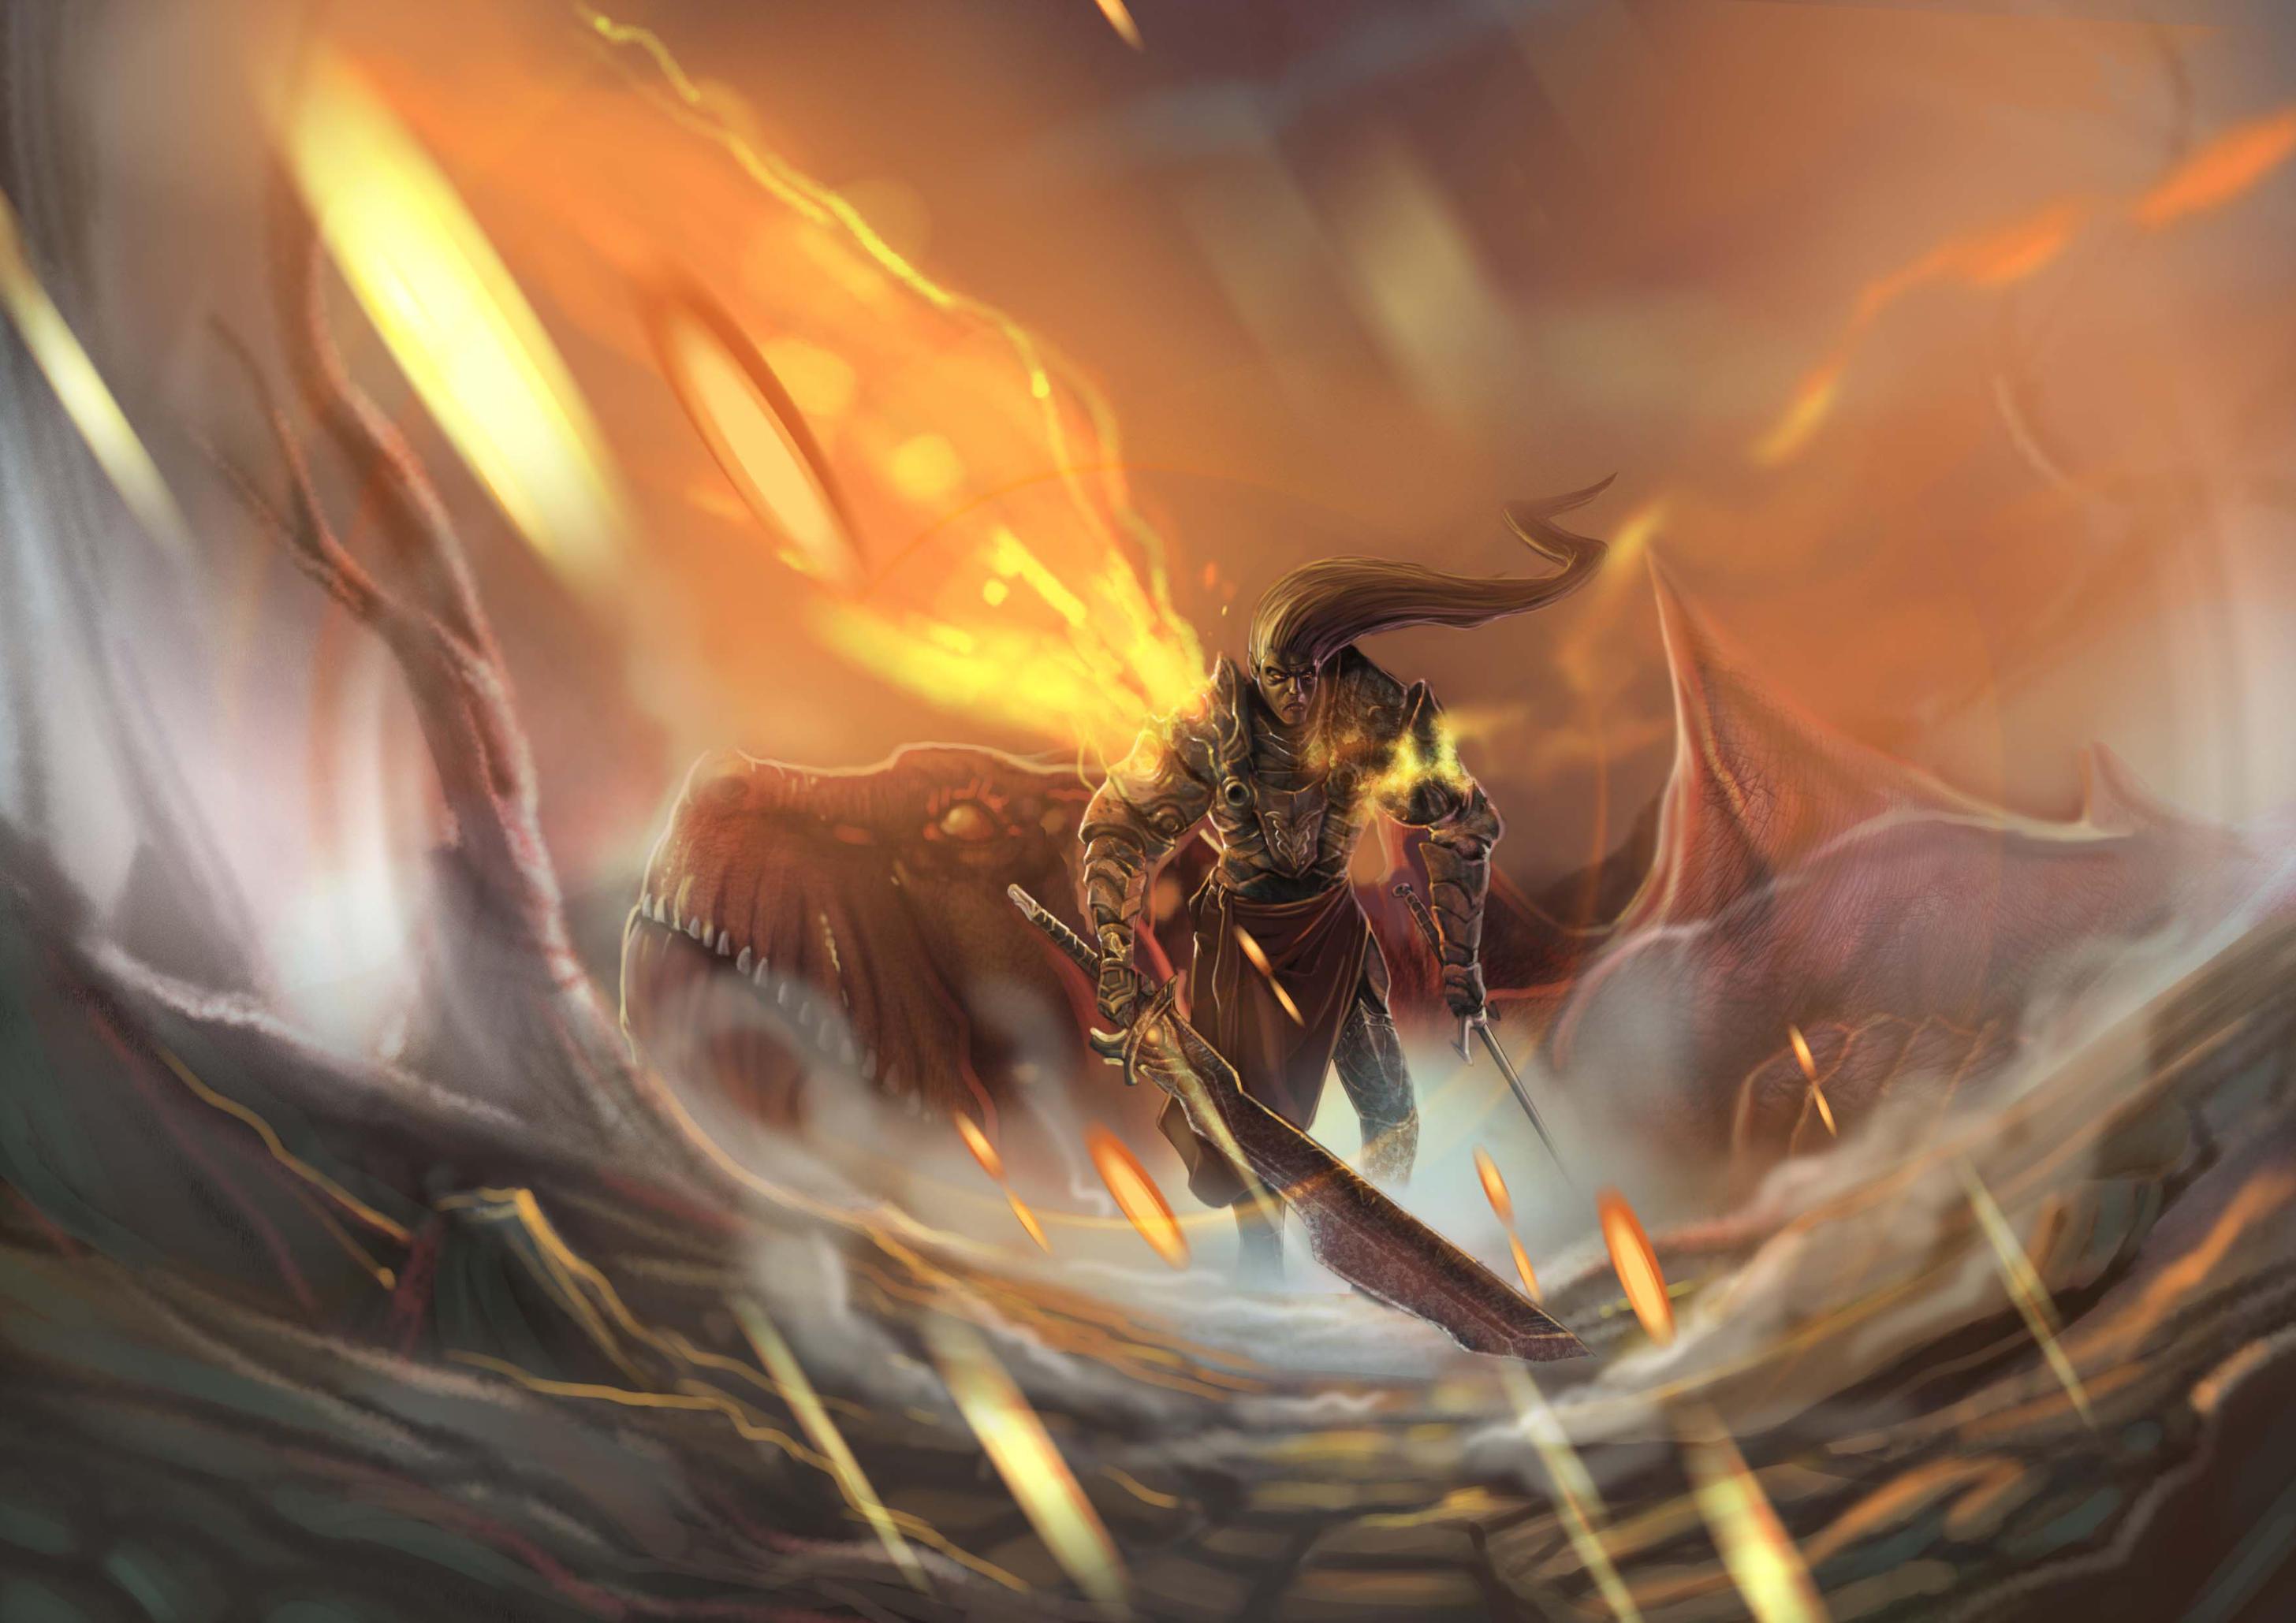 how to kill a dragon by haribon